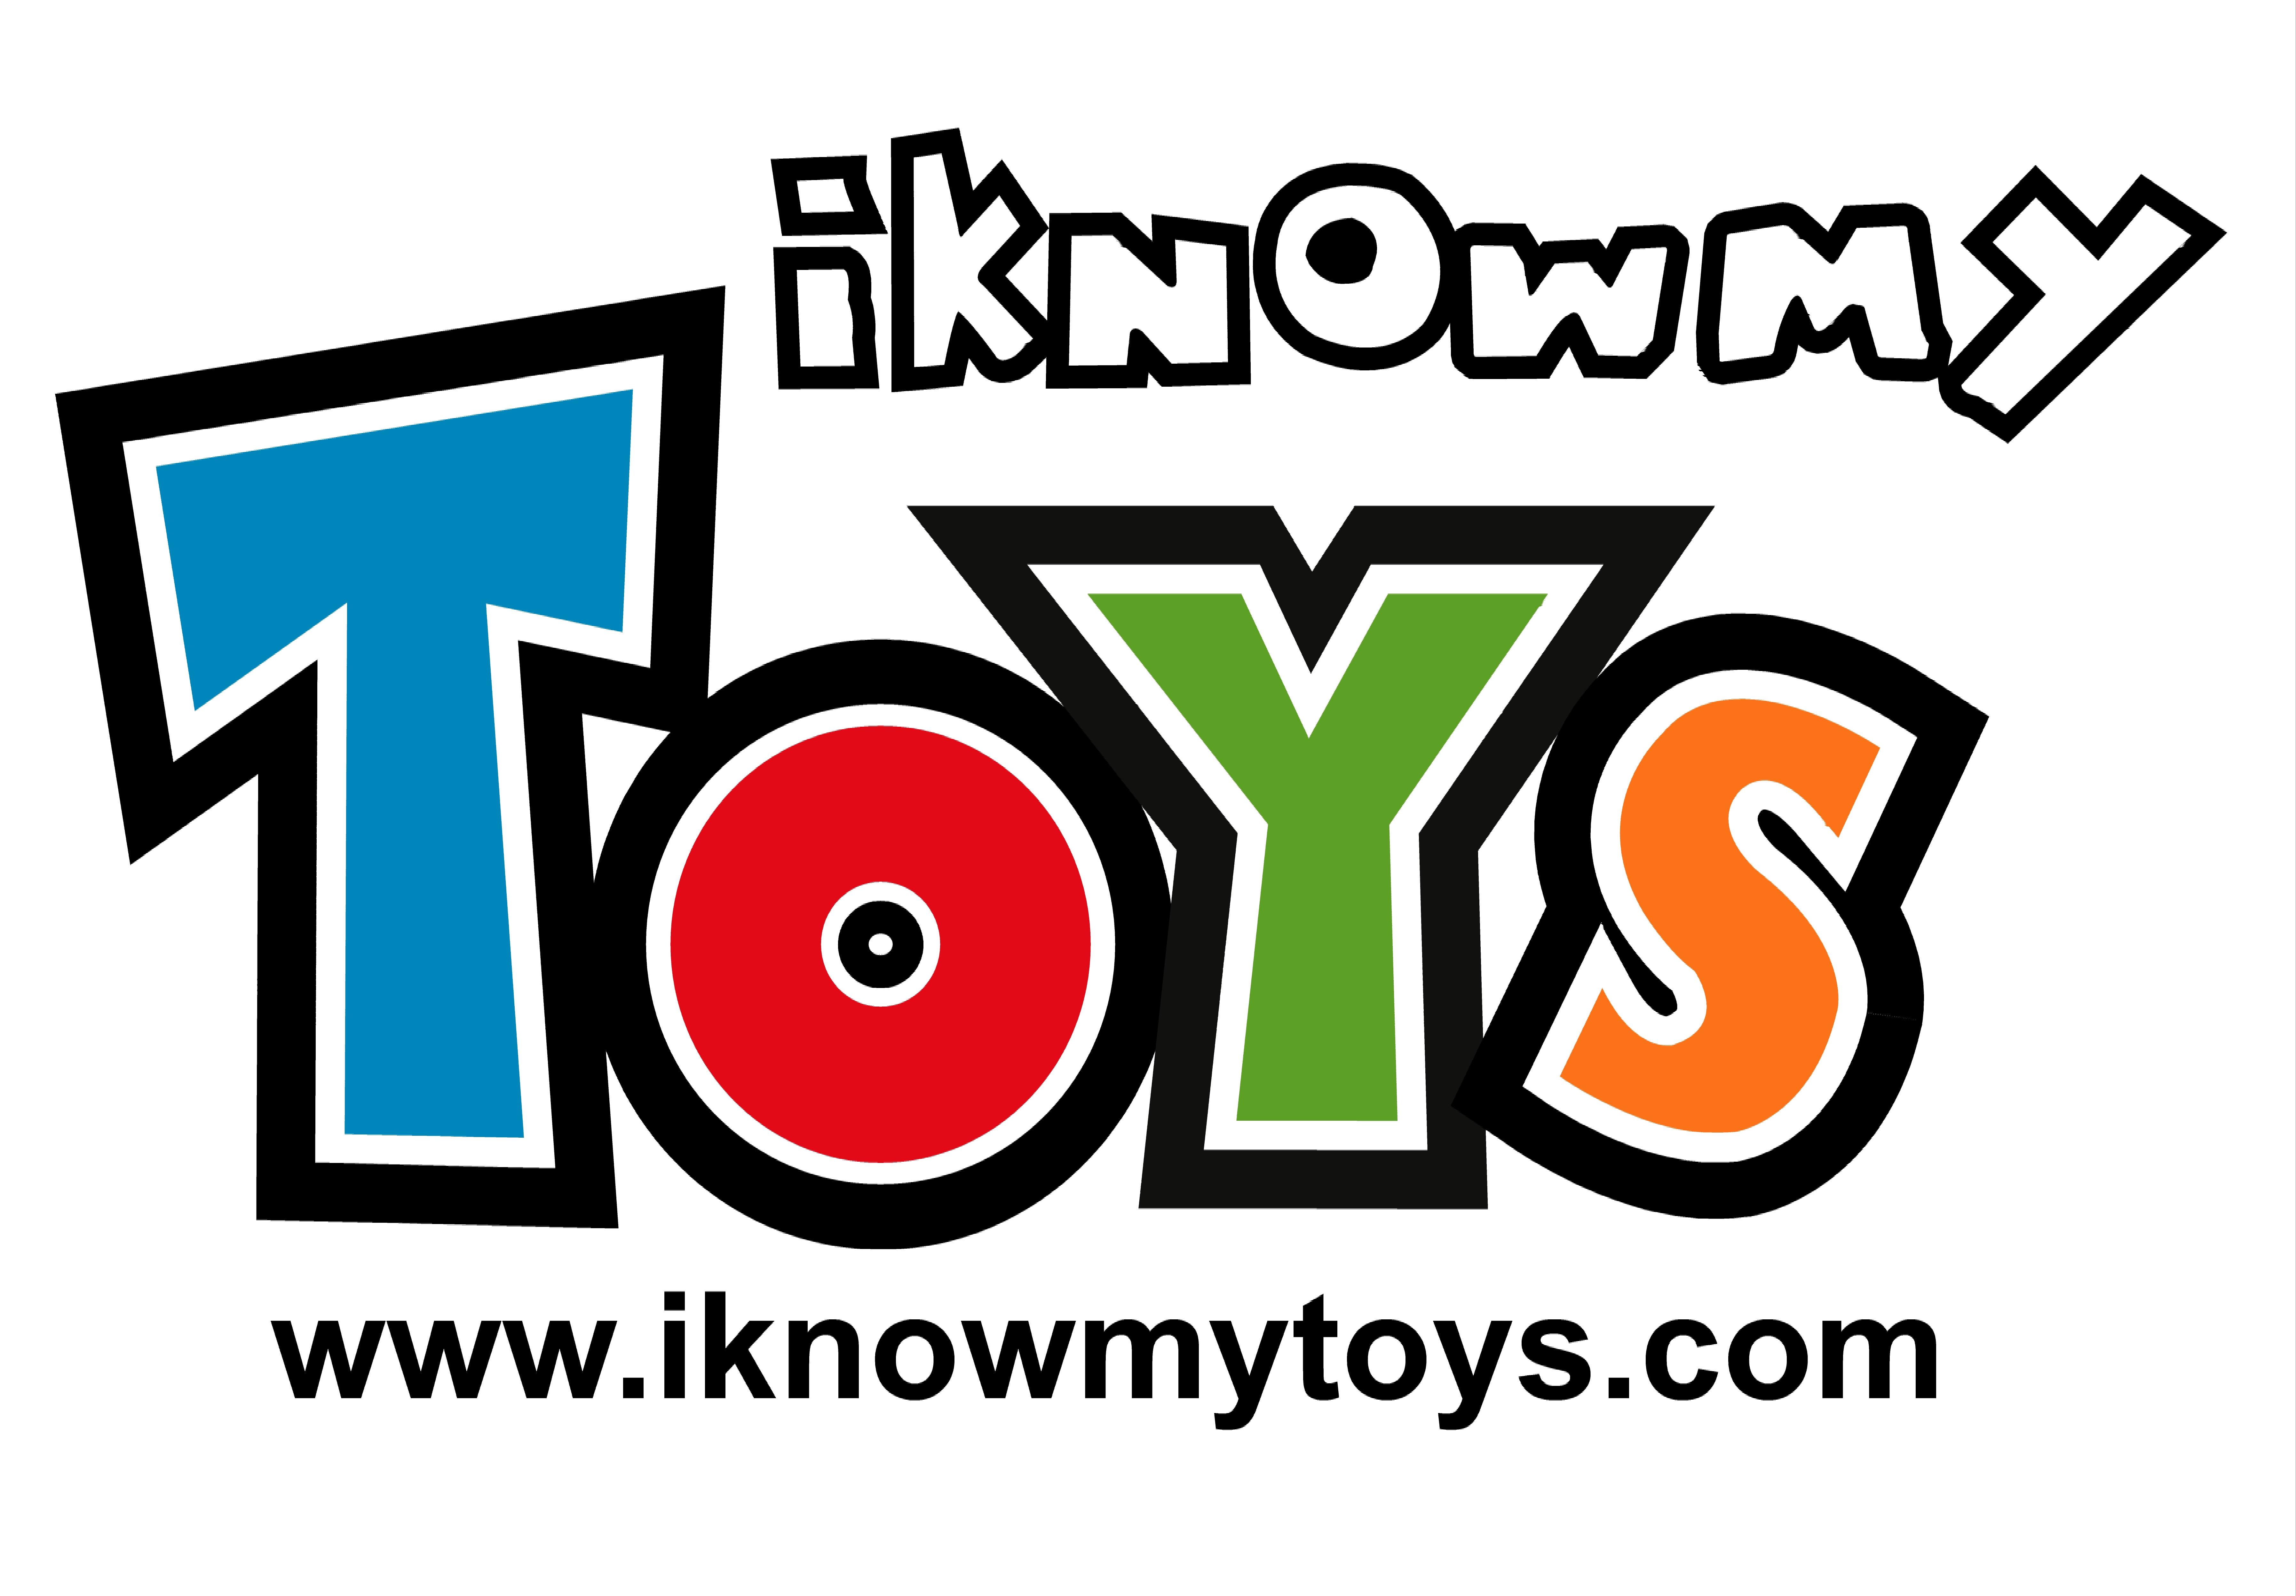 i-know-my-toys-logo-jpeg.jpg